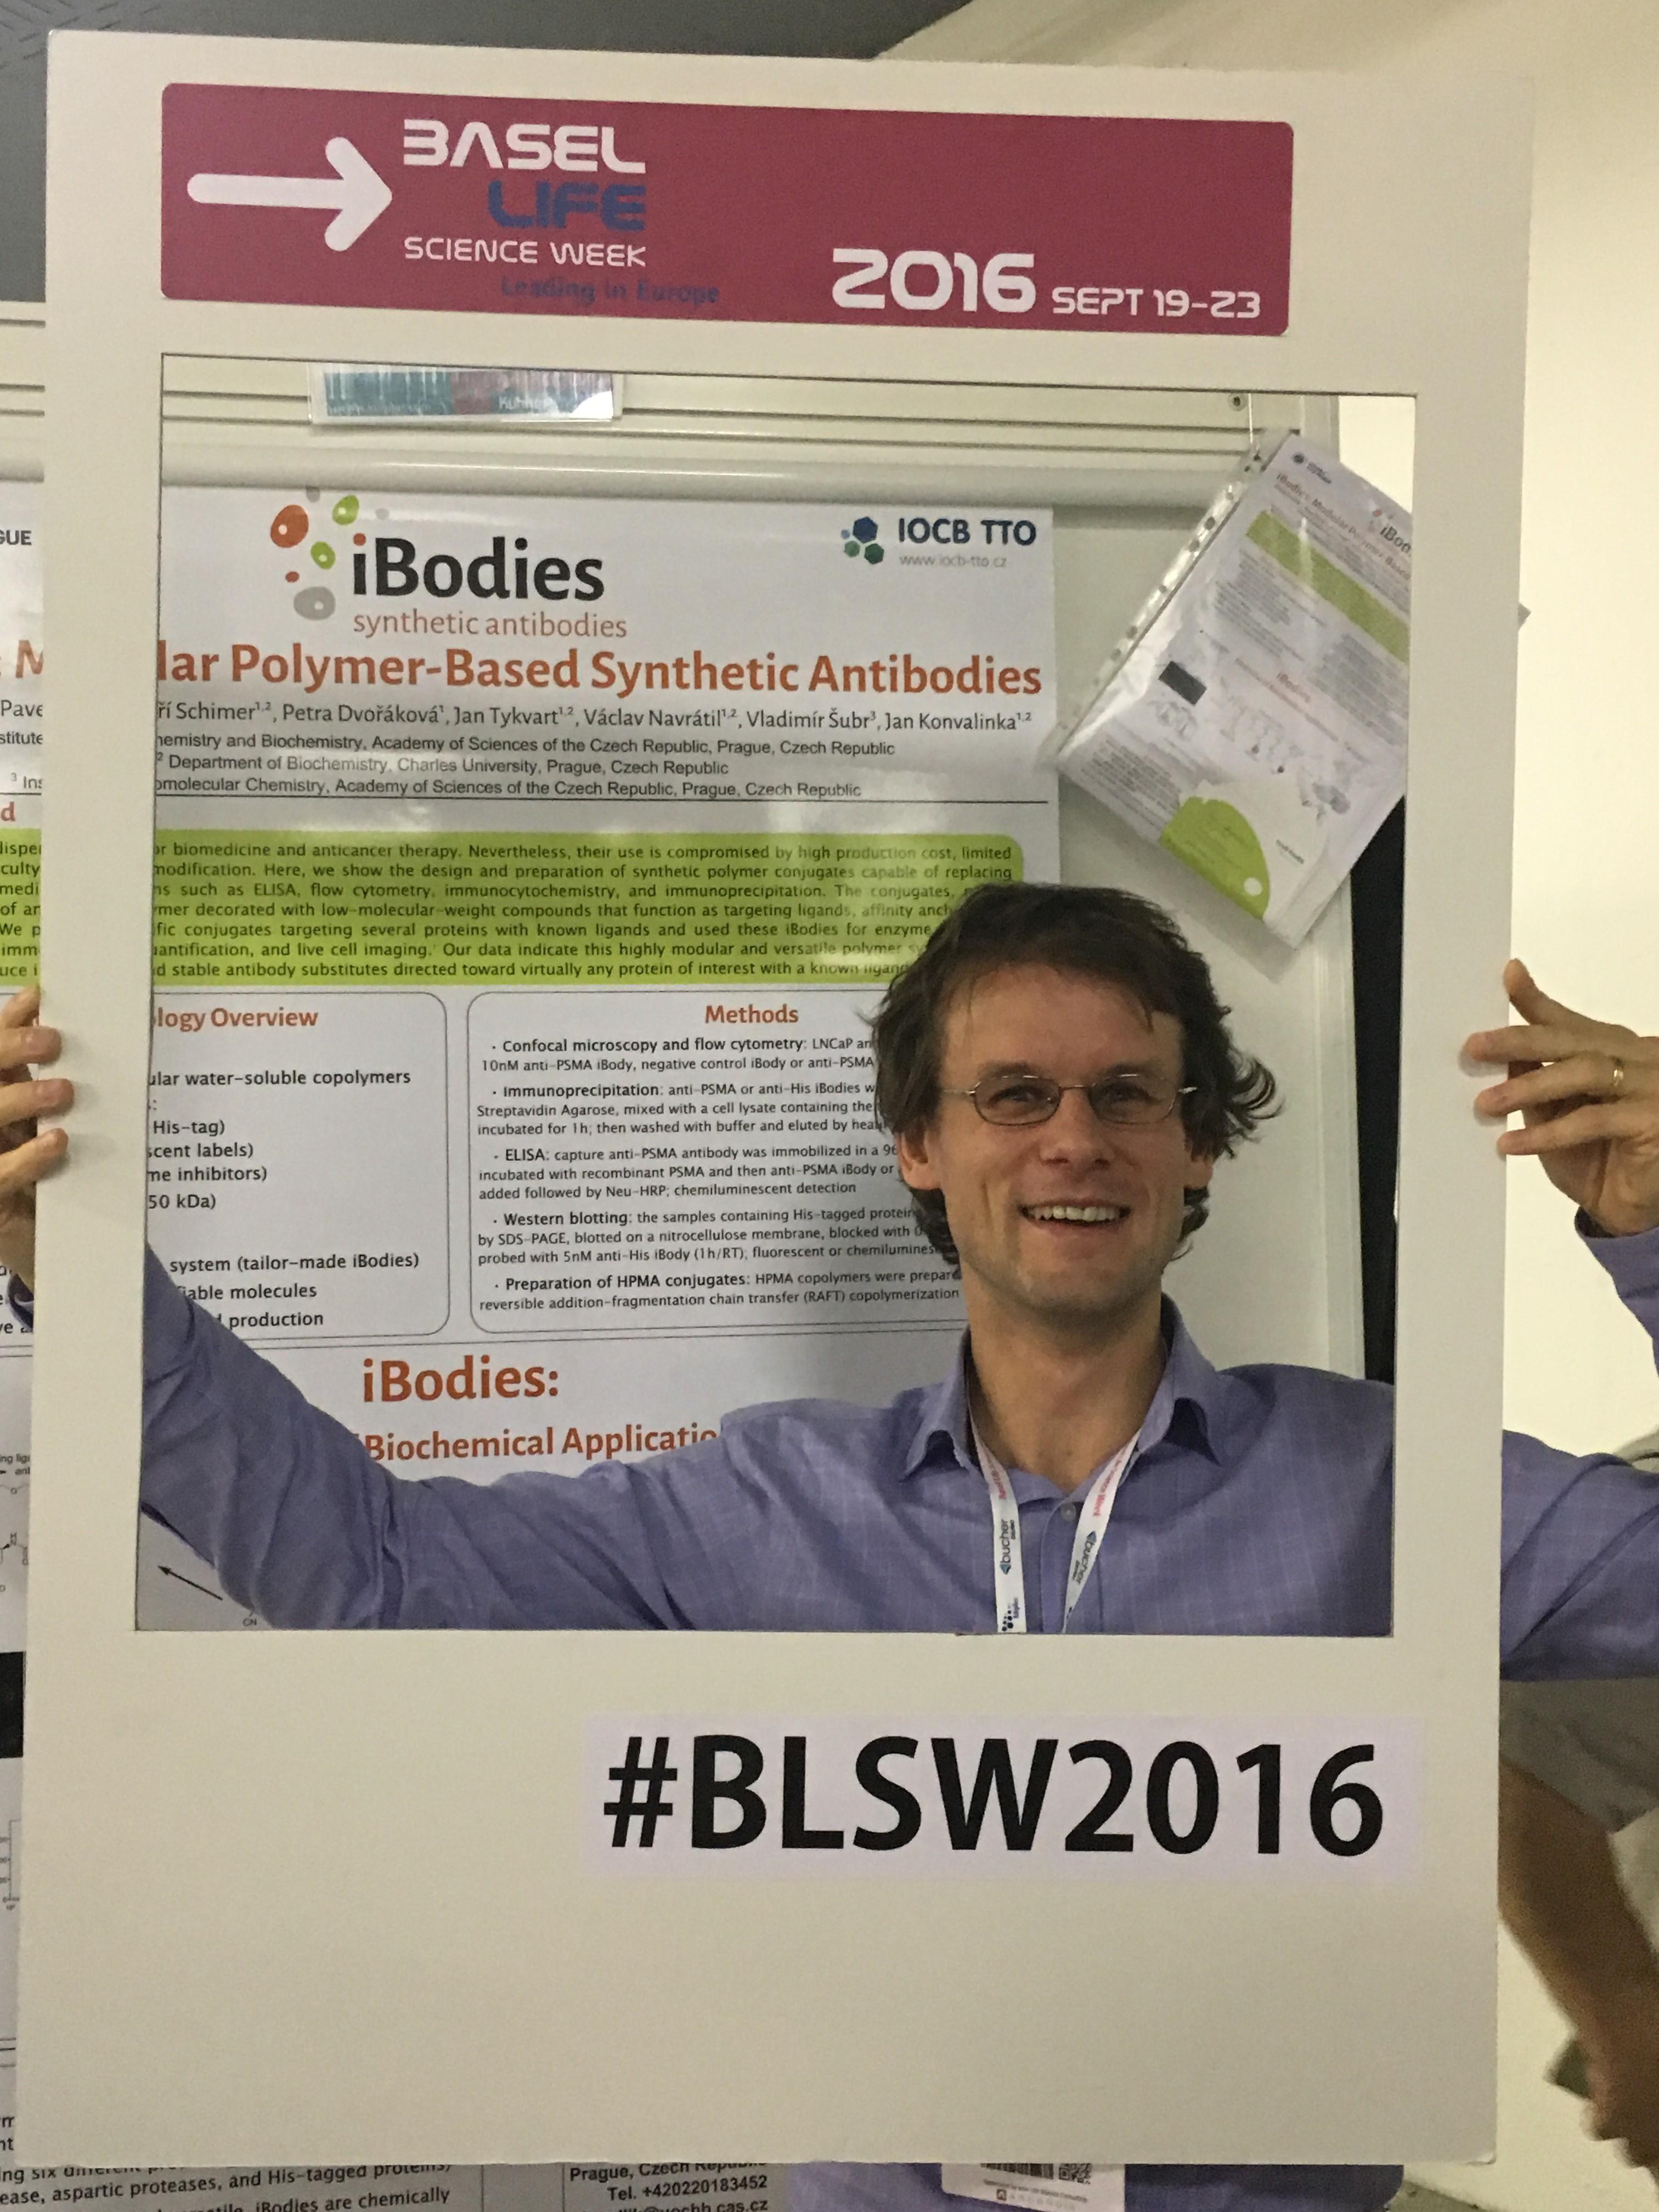 Tomas Knedlik at BLSW2016